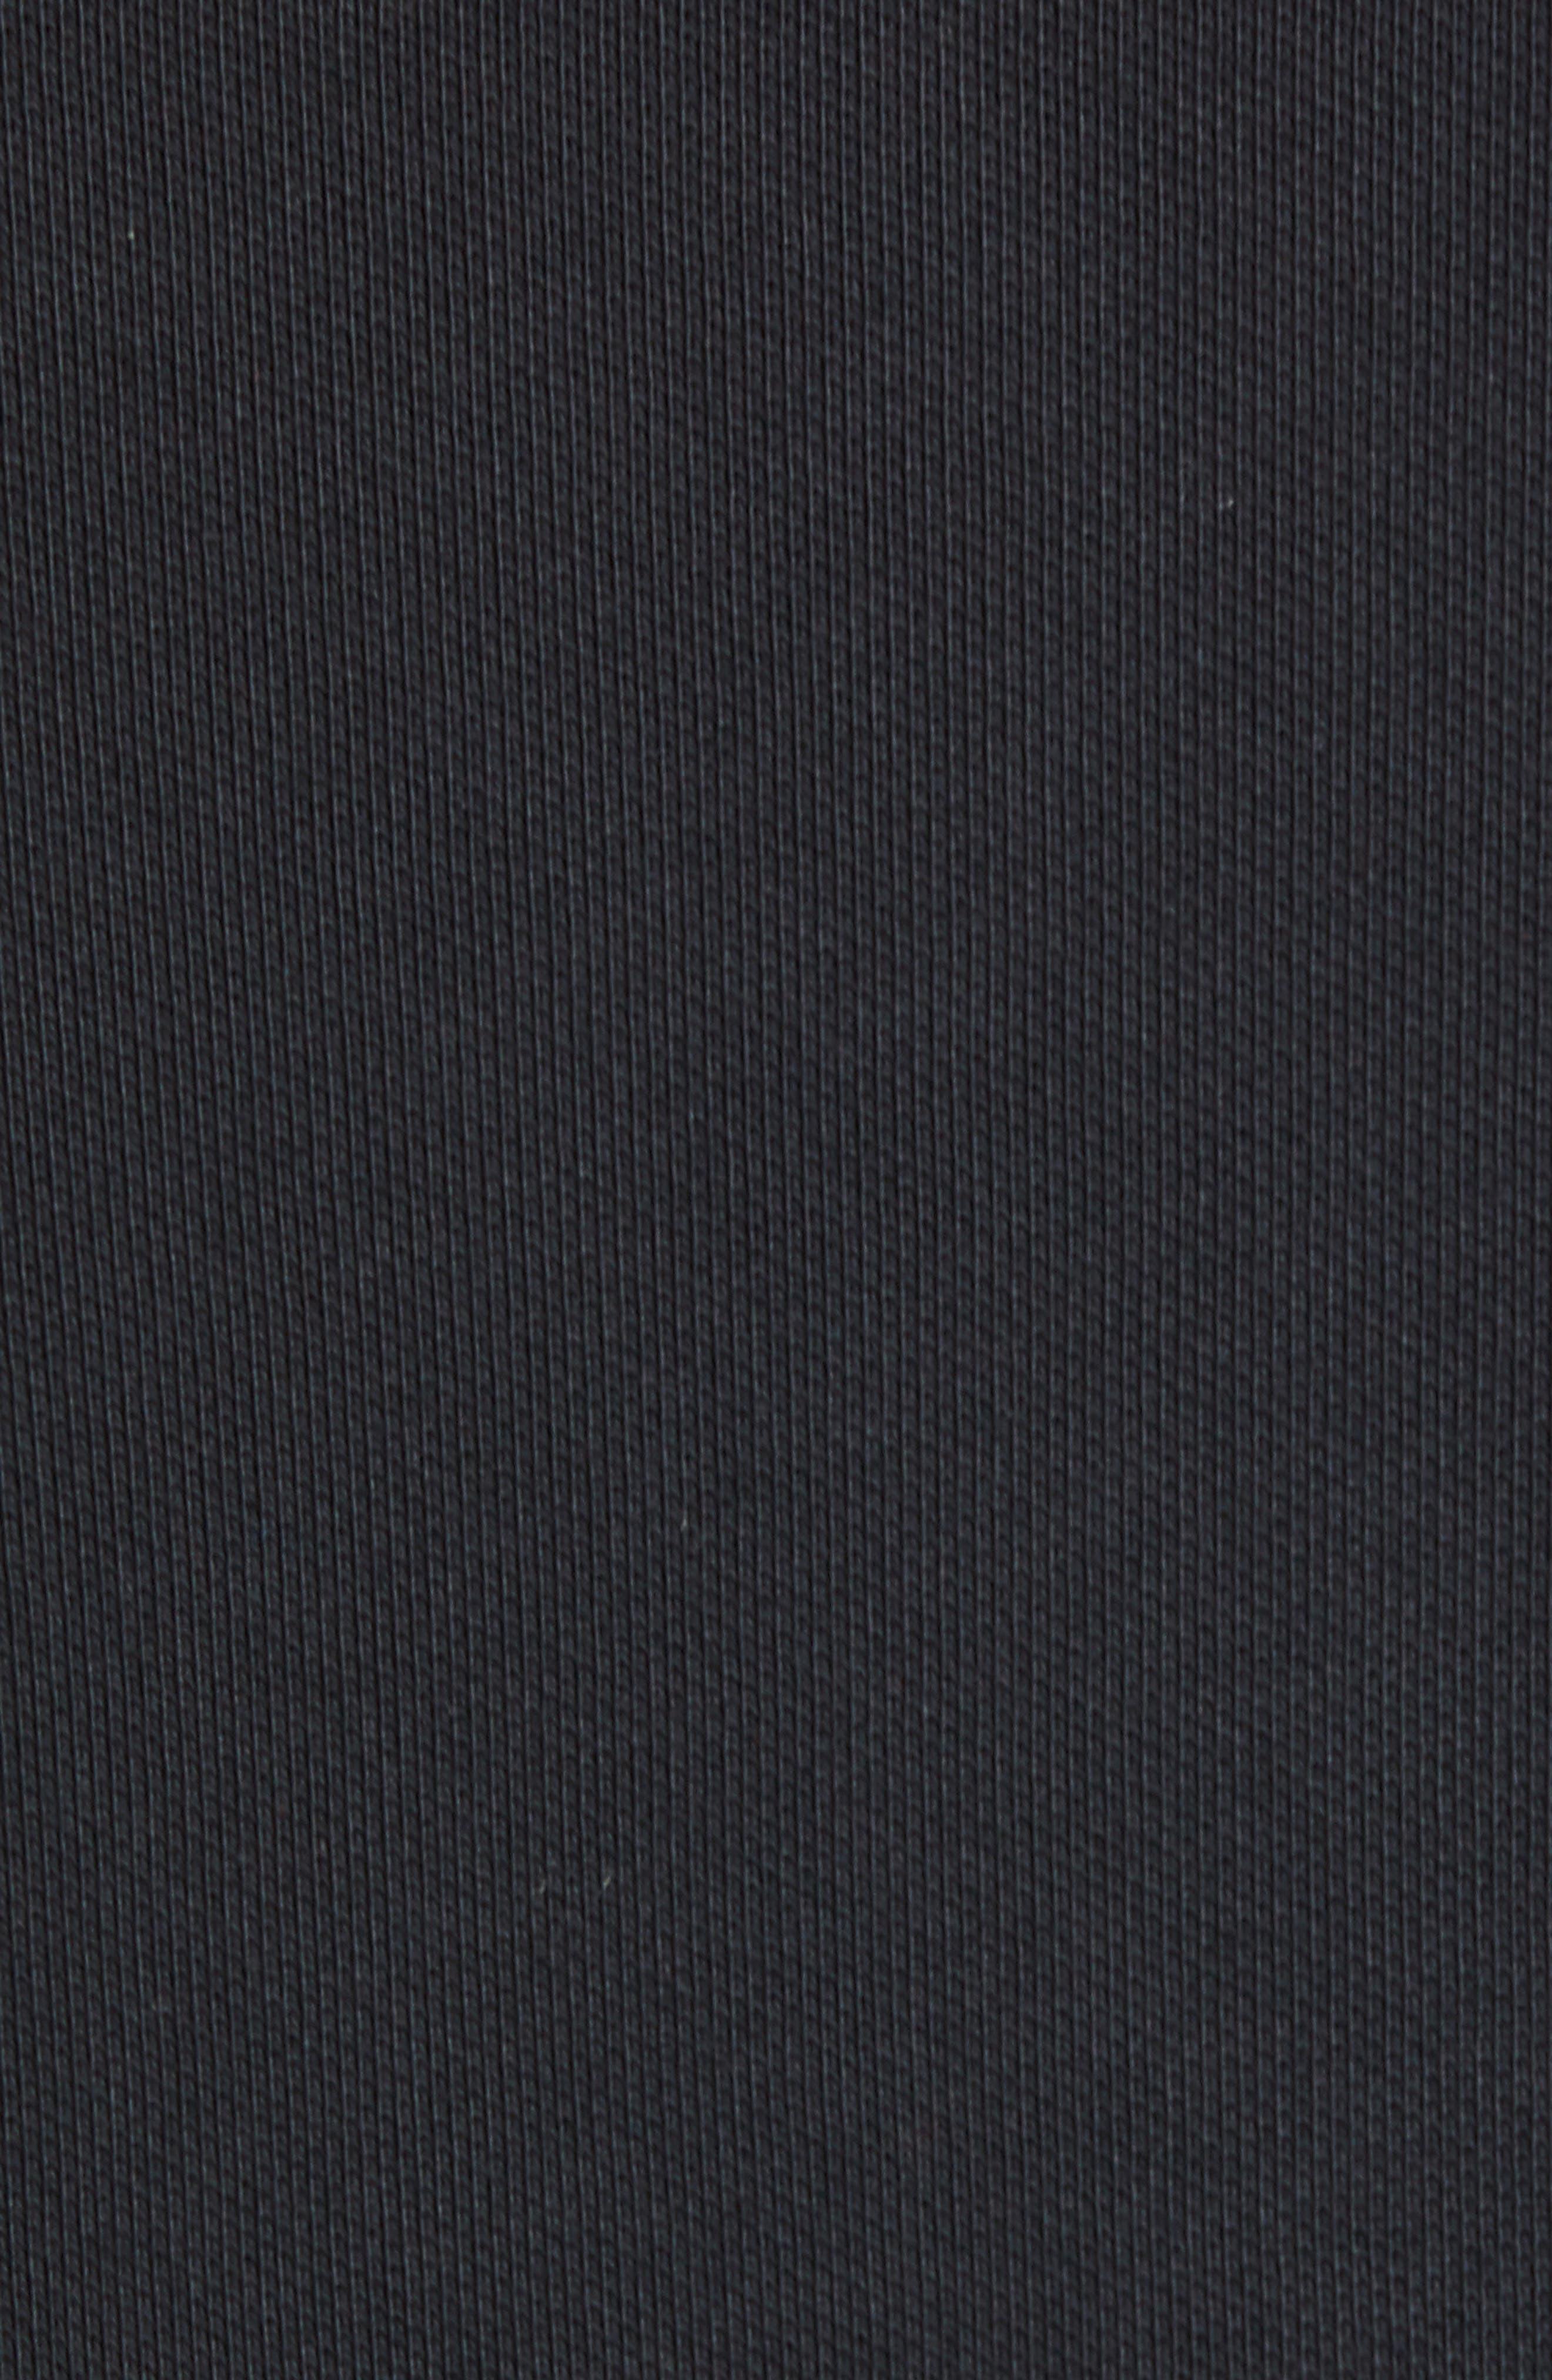 NIKE SB, Nike Dry SB Rugby Polo, Alternate thumbnail 6, color, BLACK/BLACK/BLACK/WHITE